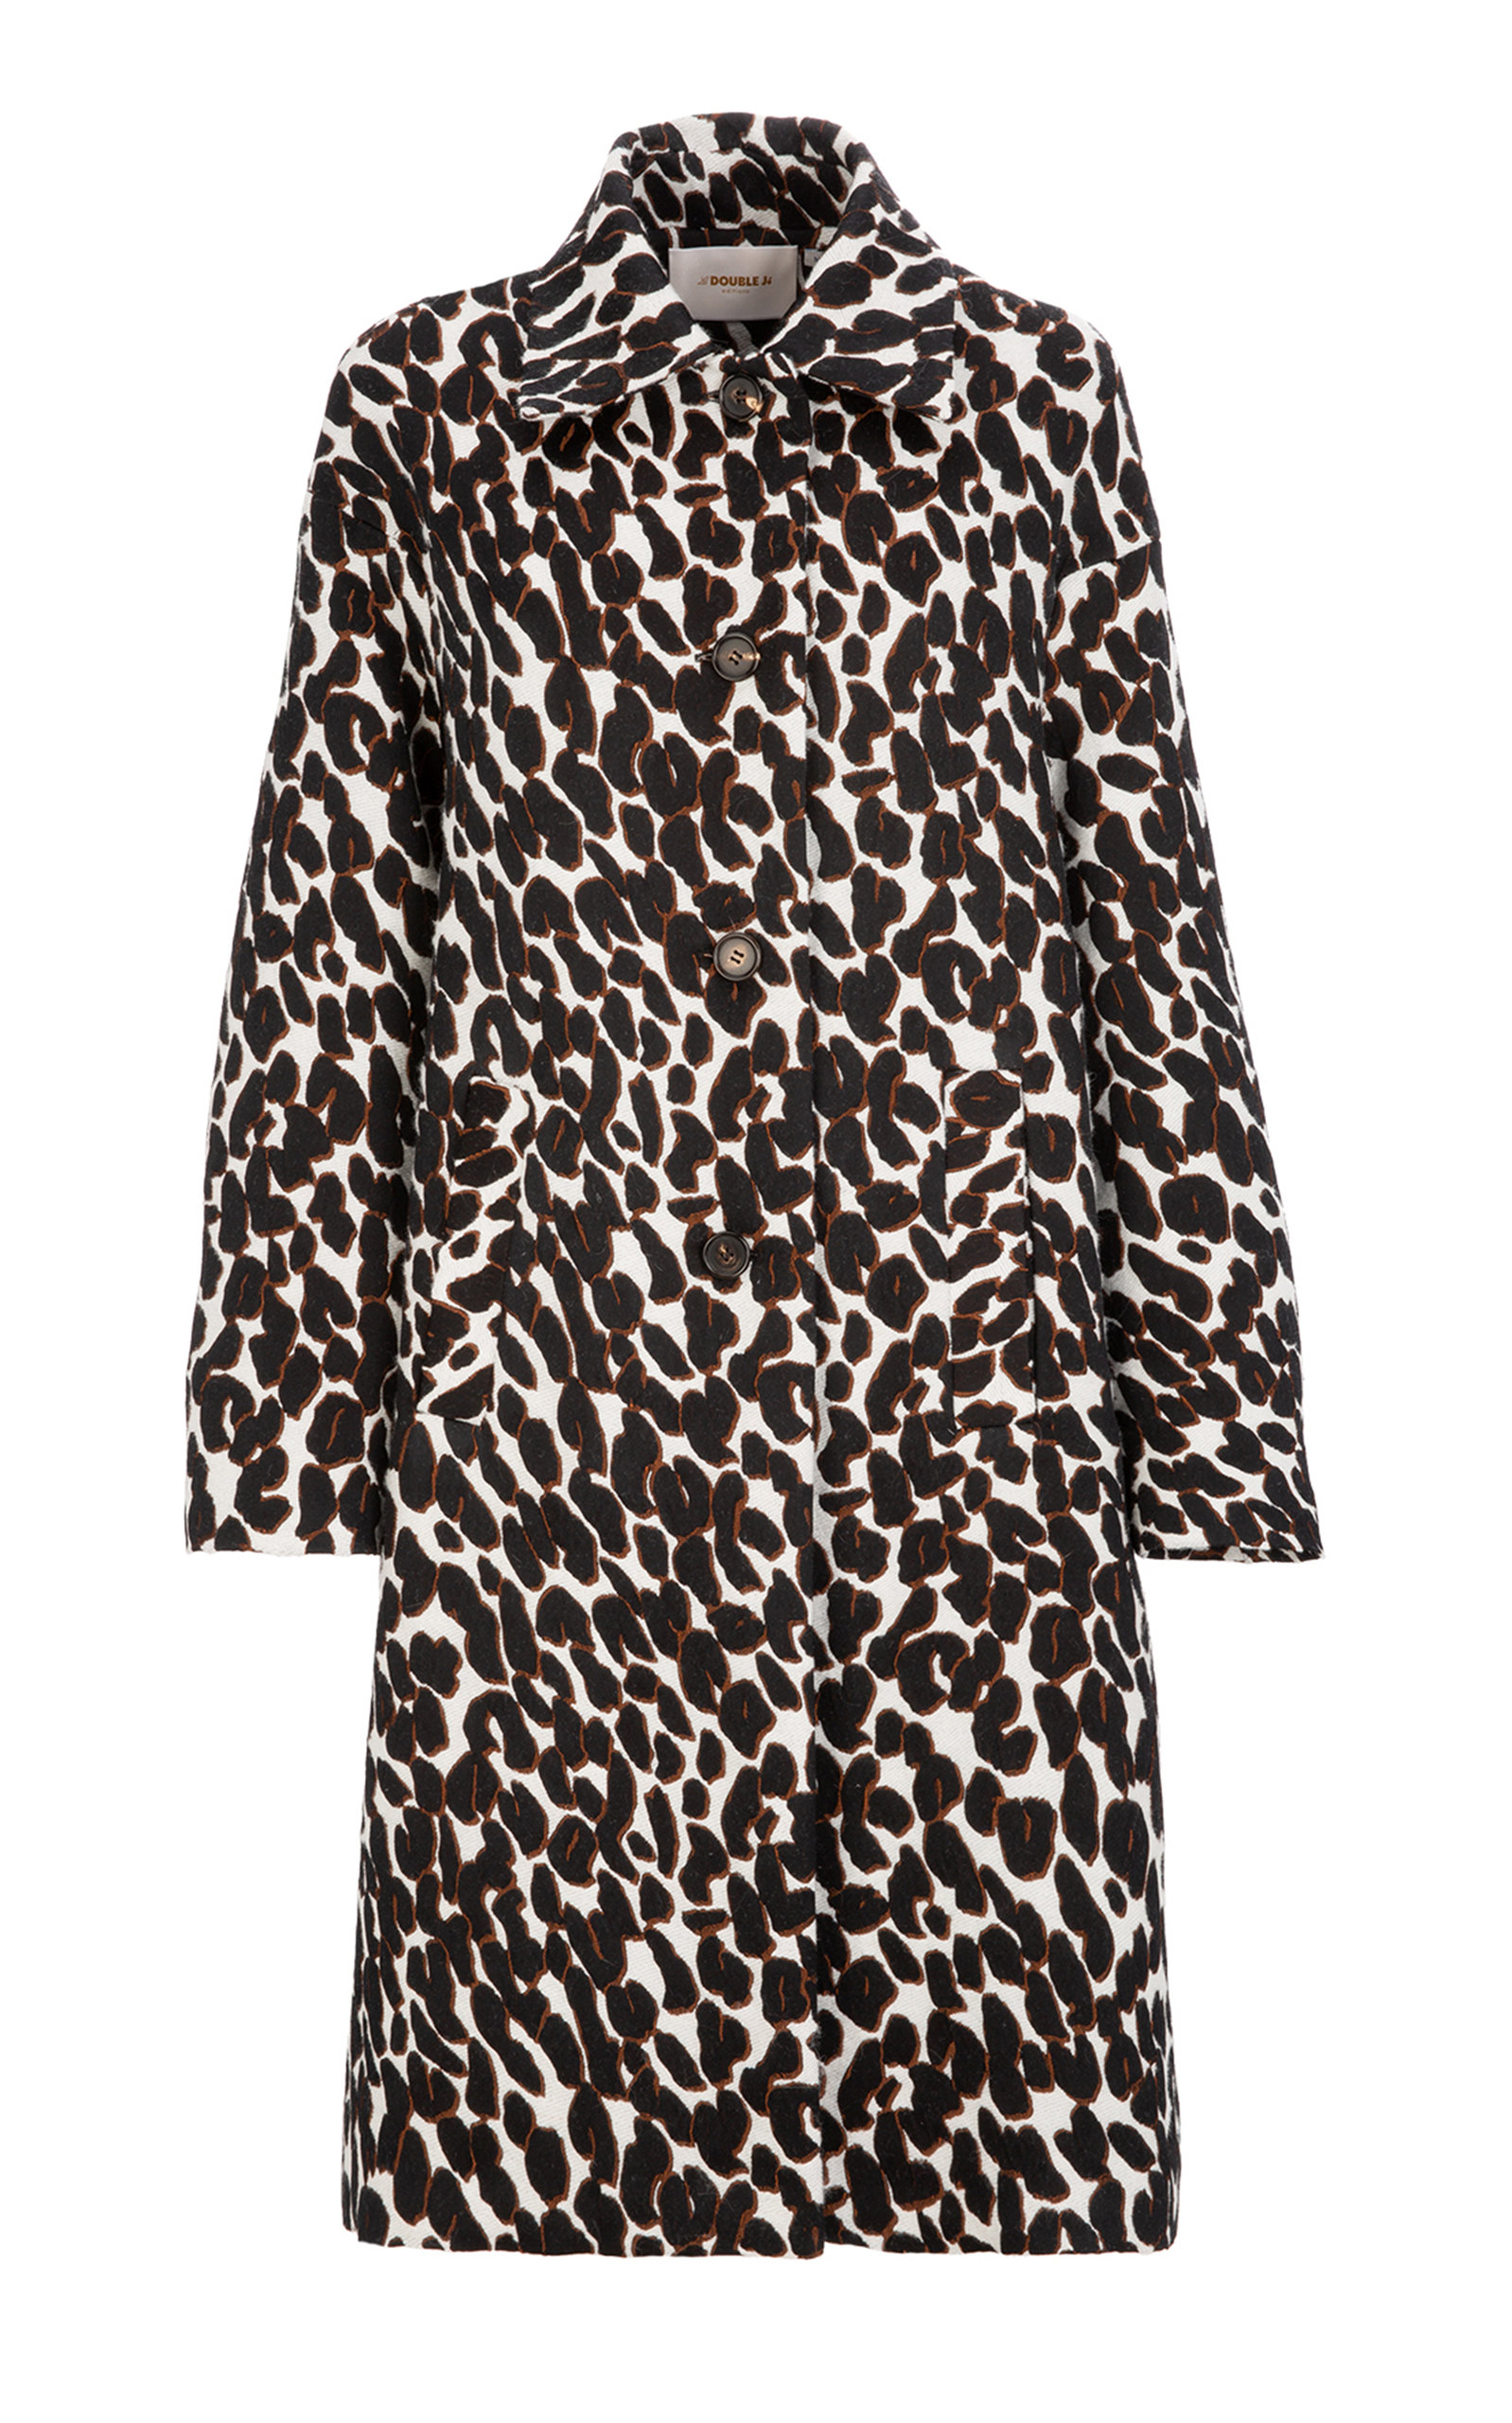 La Doublej Coats OVERSIZED BOXY ANIMAL PRINTED COCOON COAT